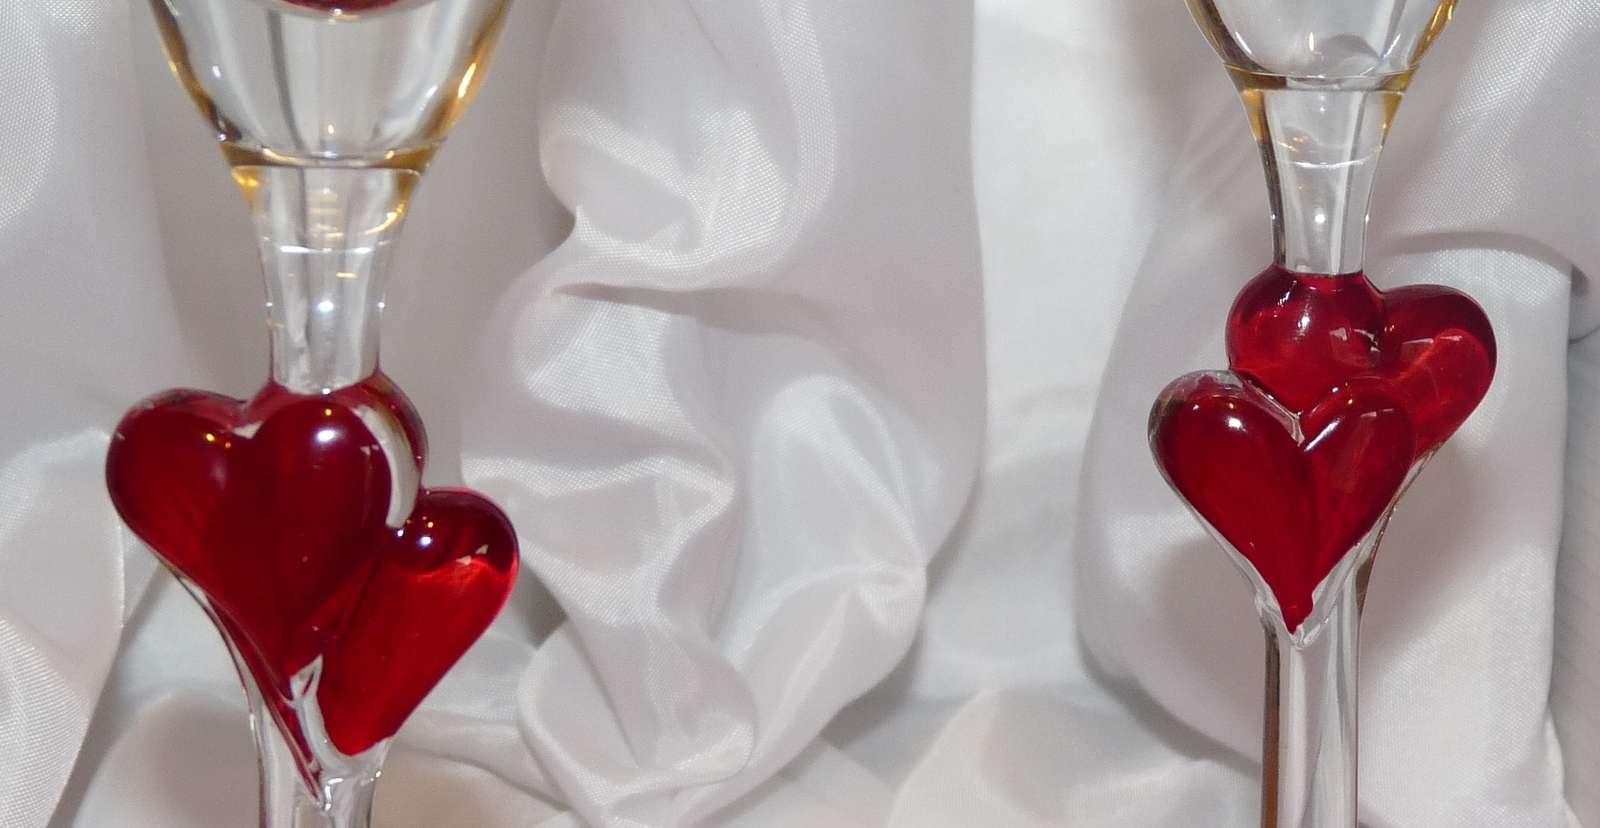 Sklenice Amorek-sada s červenými srdíčky  - Obrázek č. 2